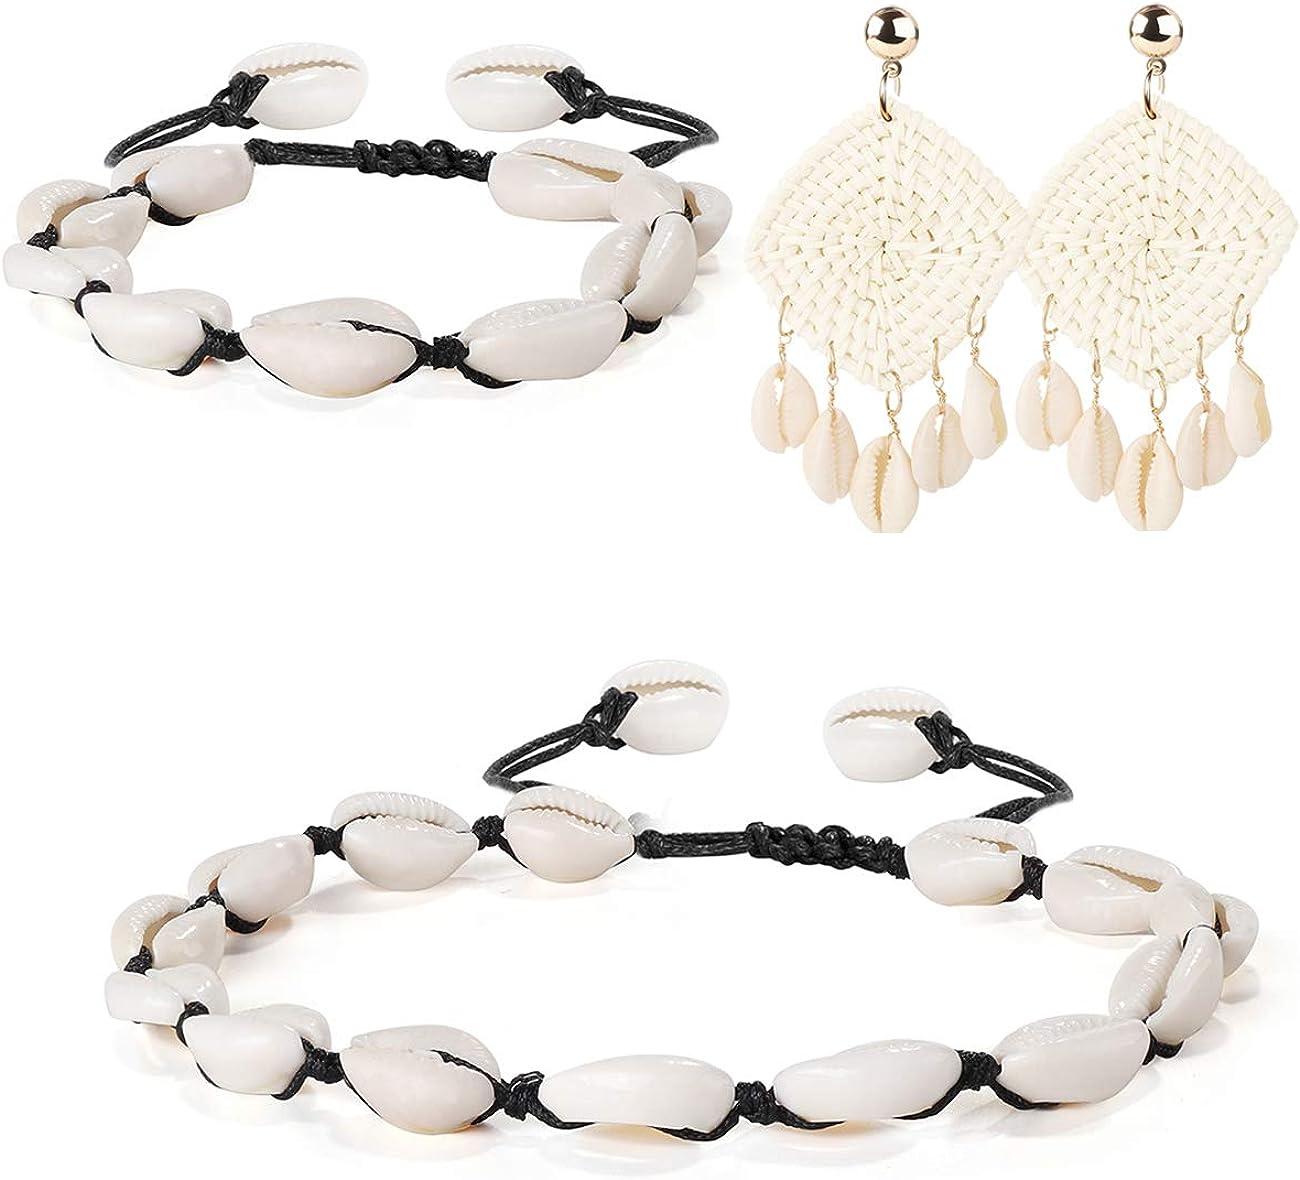 JOERICA Natural Shell Choker Necklace and Earrings Set Handmade Bracelet Anklet Foot Jewelry for Women Girls Adjustable